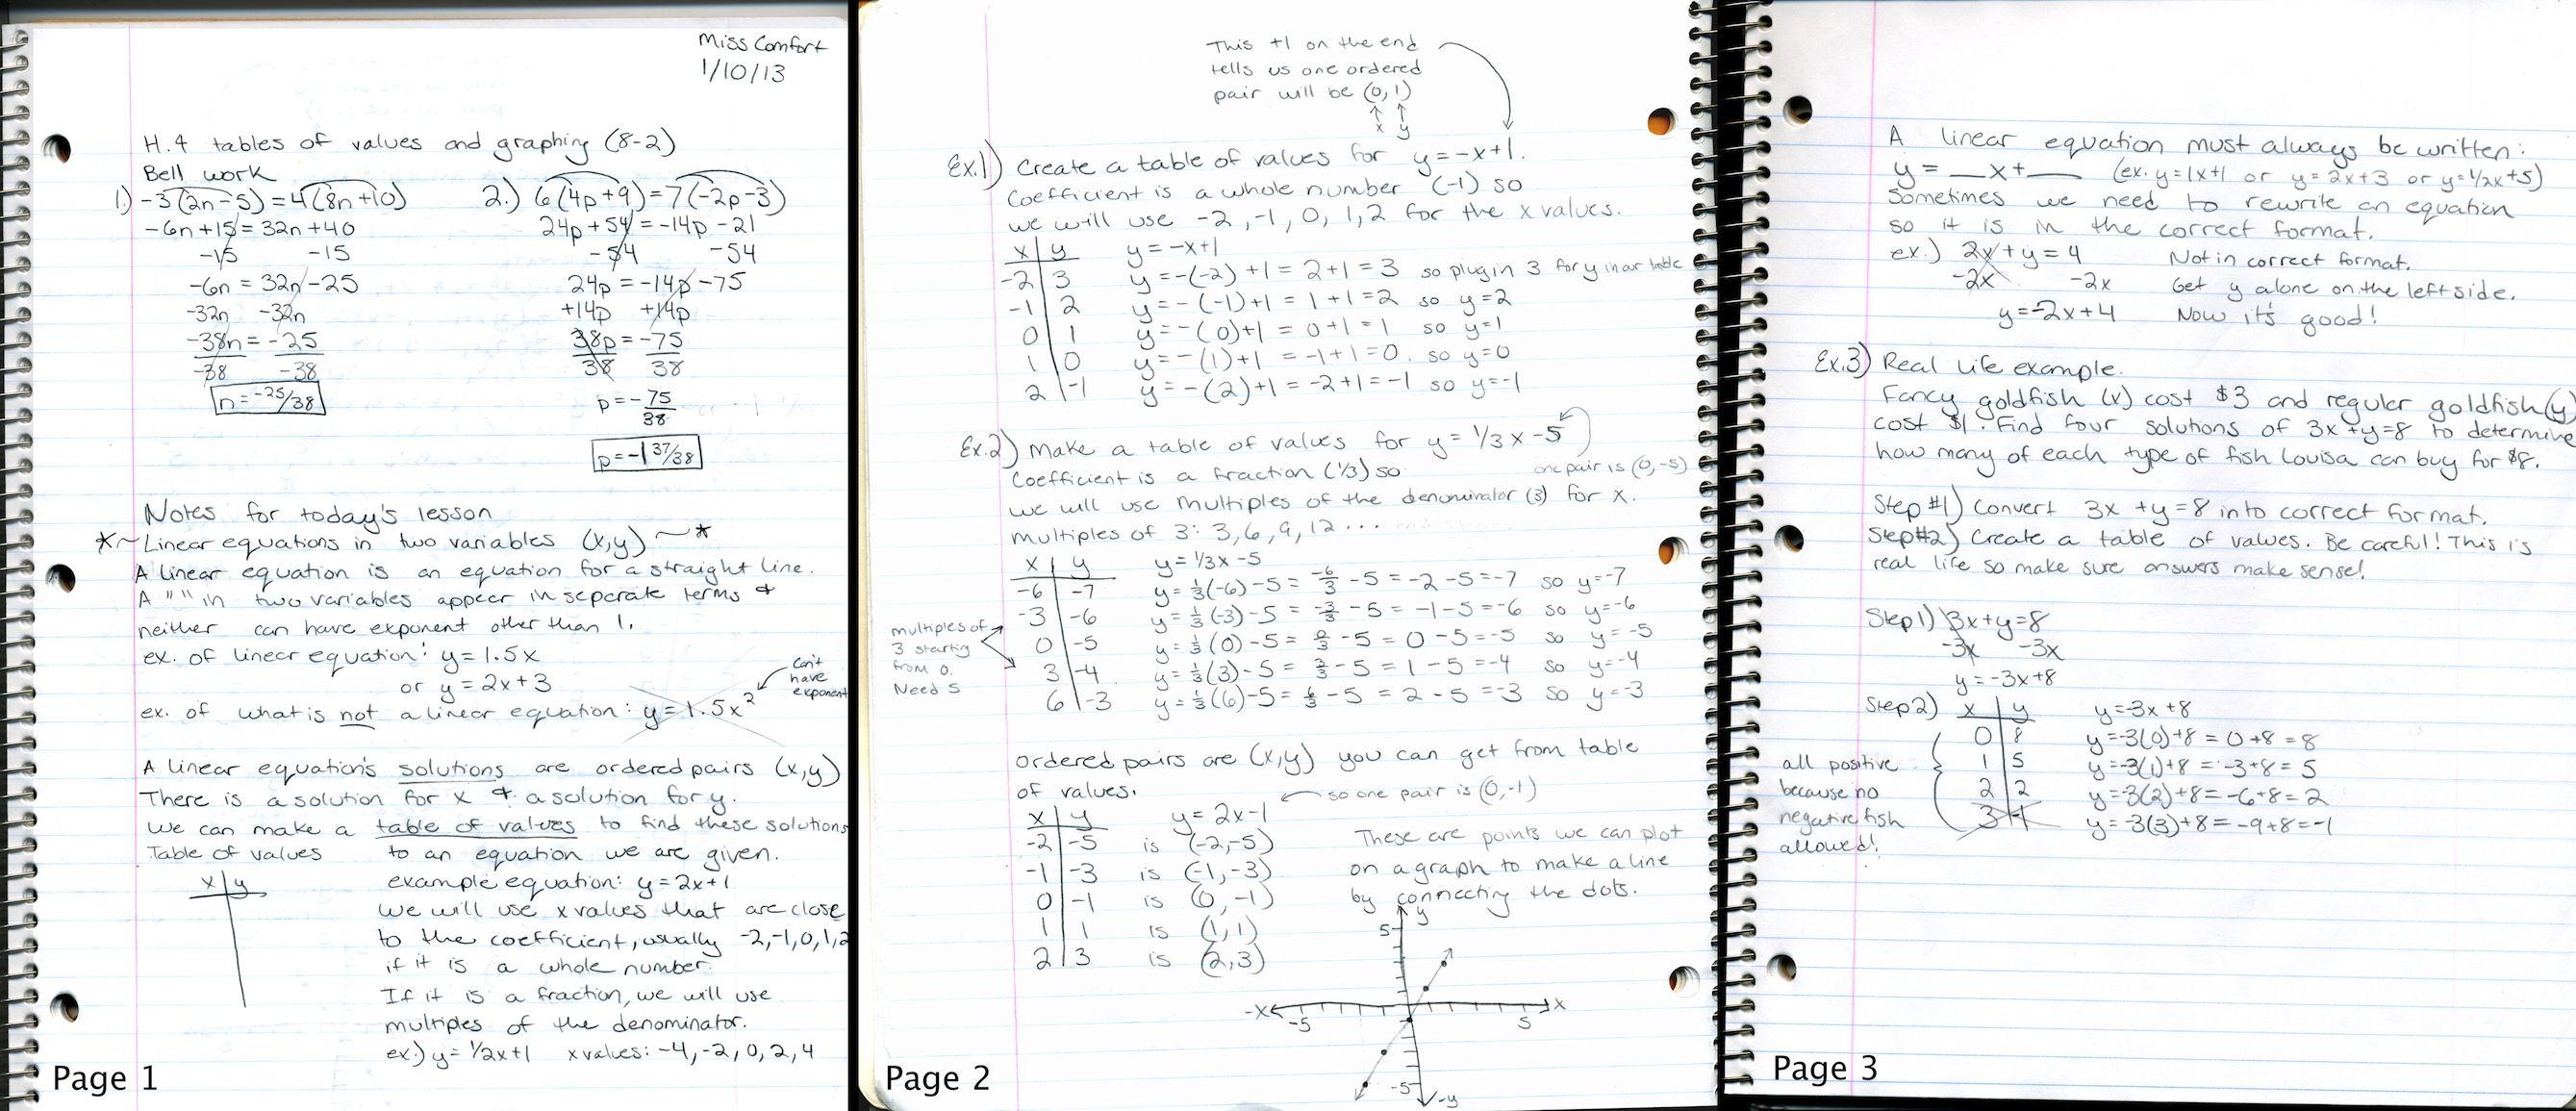 My Math Notebook--We must bring our spiral math notebook